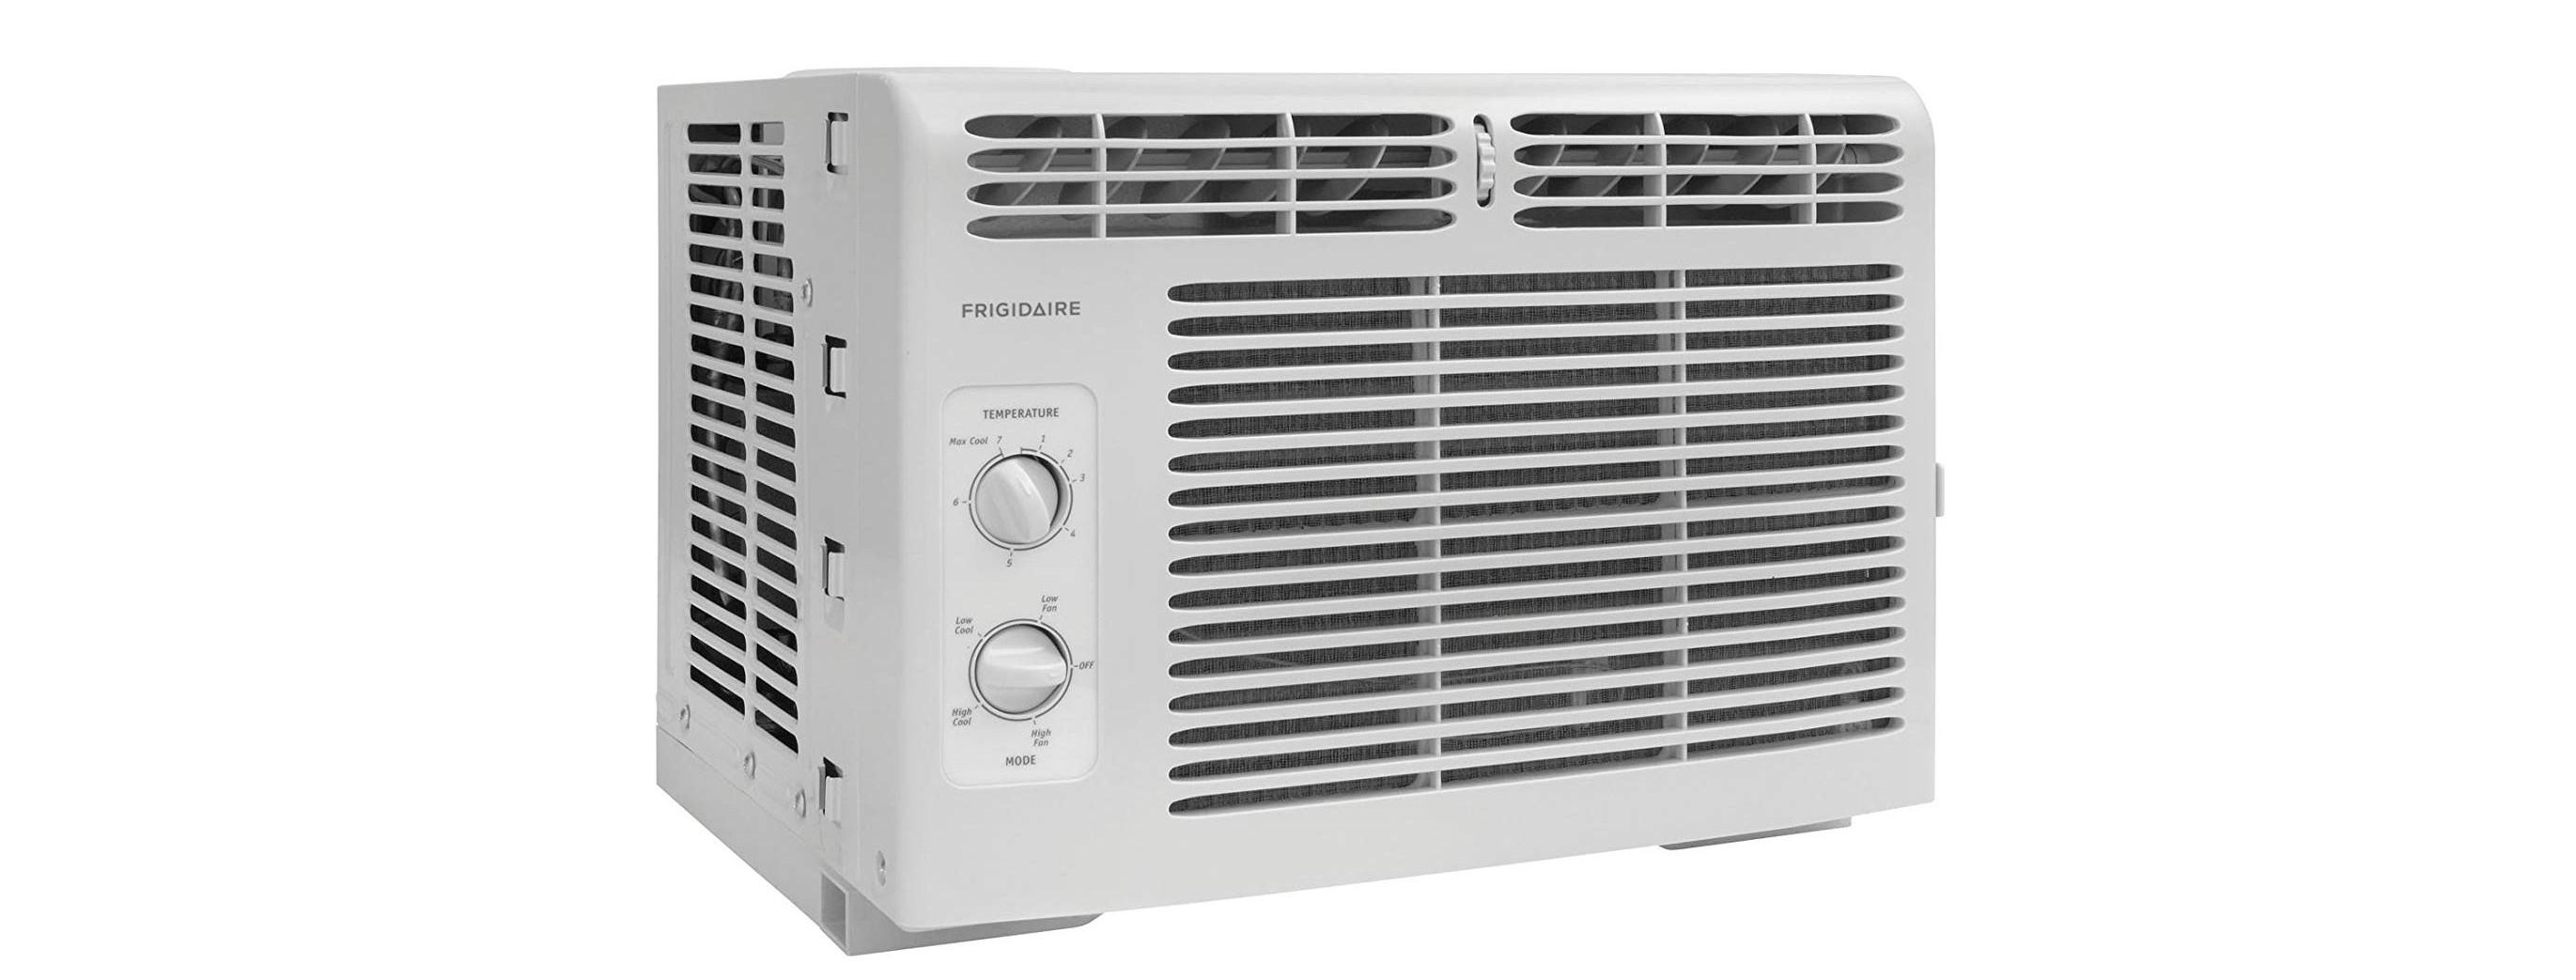 Frigidaire FFRA0511R1 Window Air Conditioner